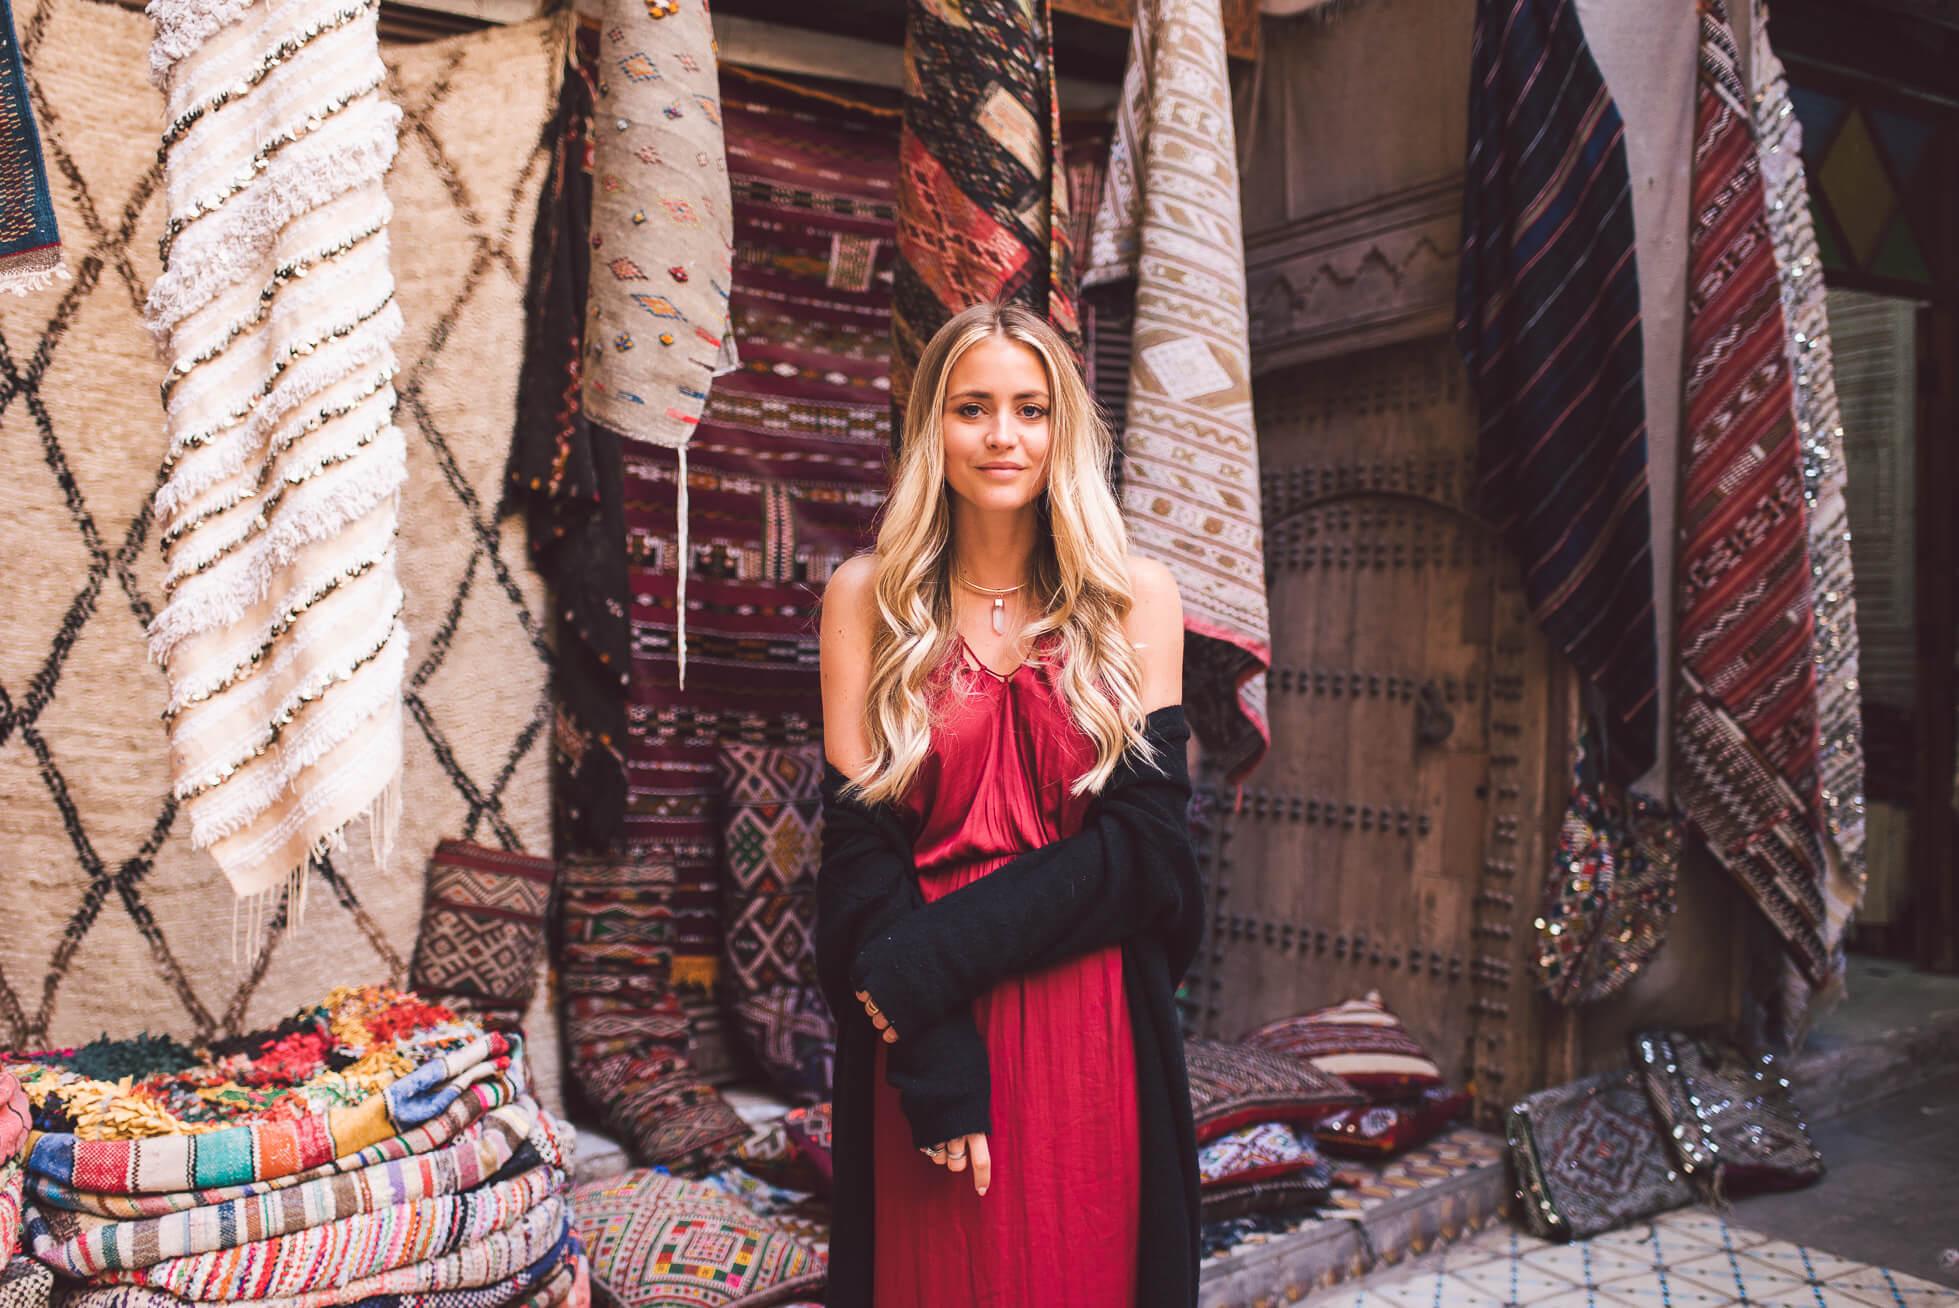 janni-deler-medina-marrakechDSC_0230